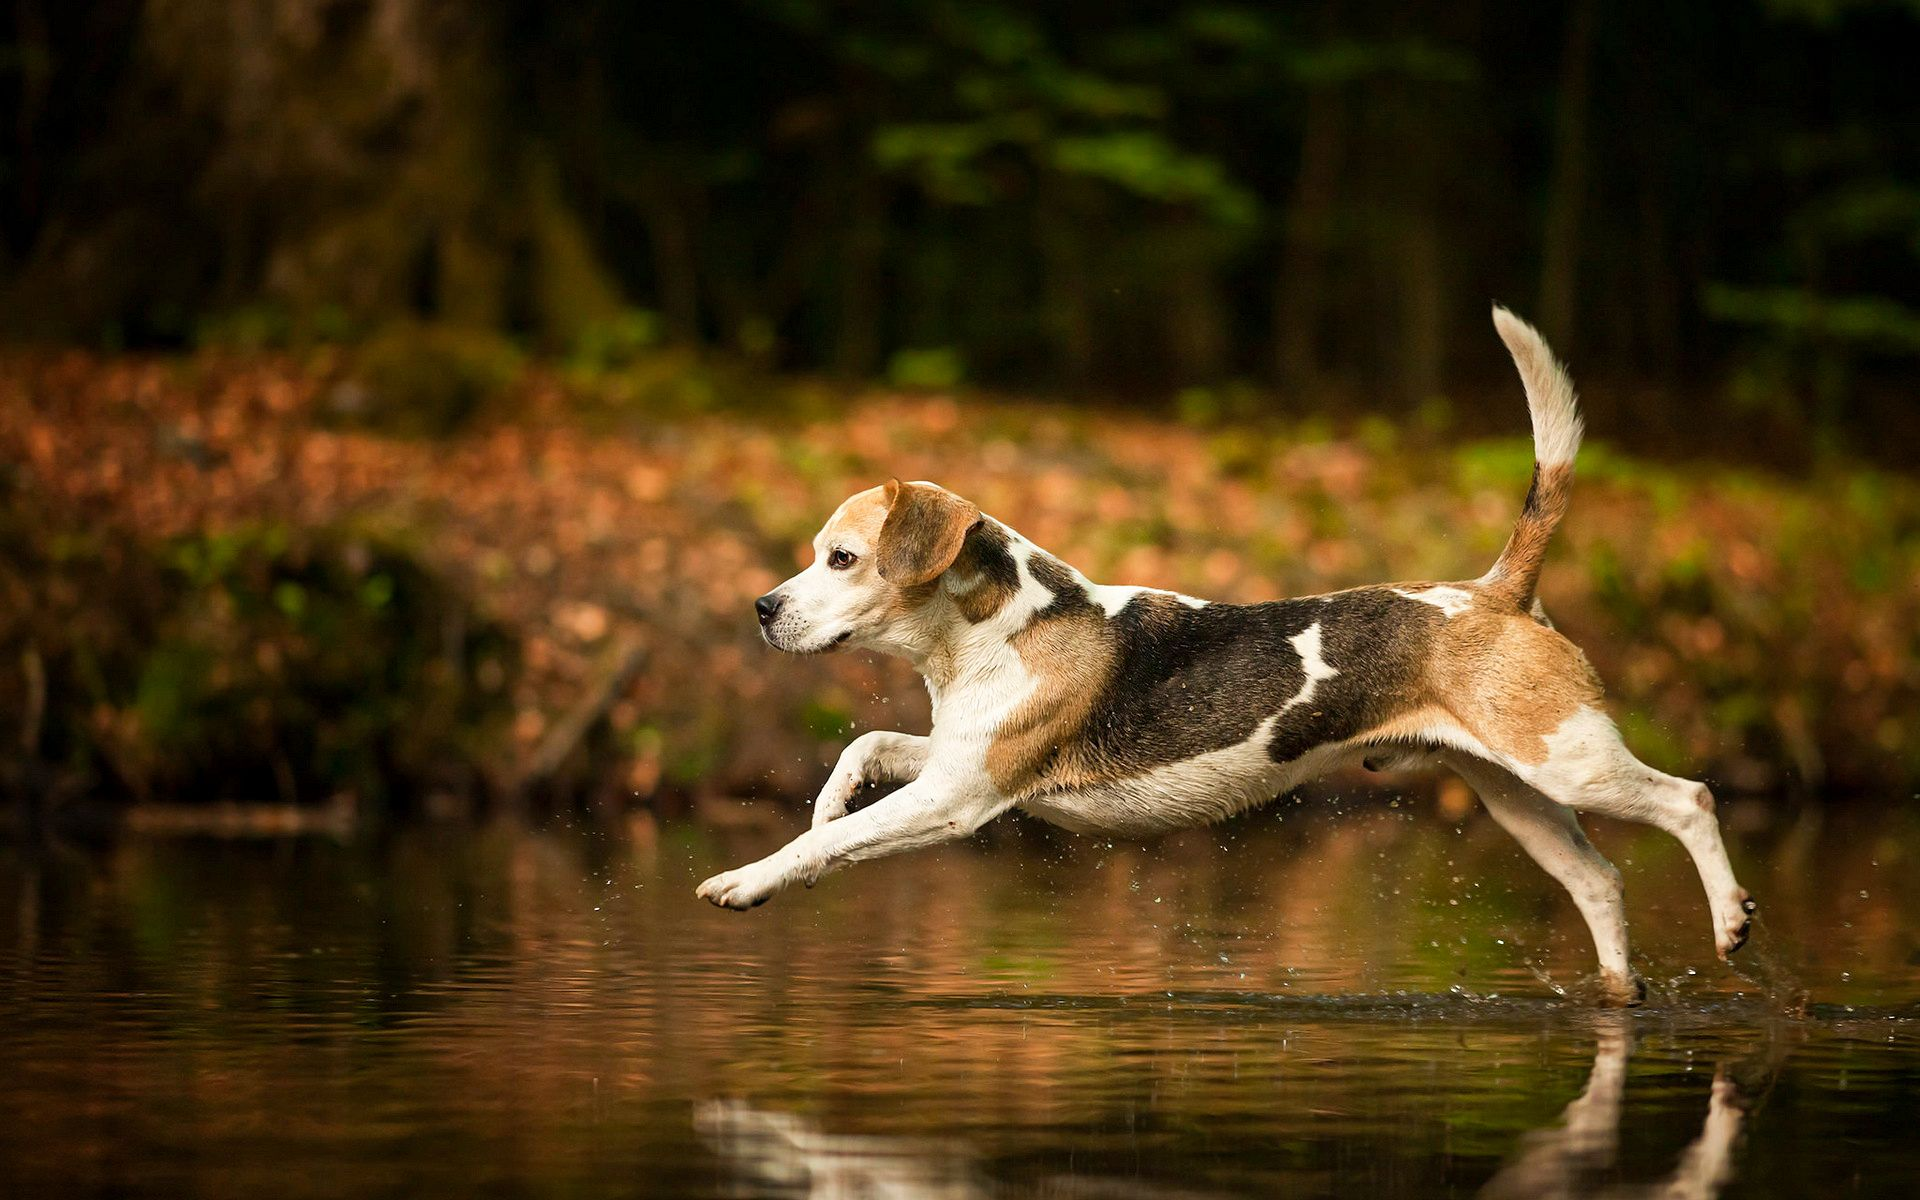 Beagle wallpapers HD Beagle puppy, Cute beagles, Beagle dog